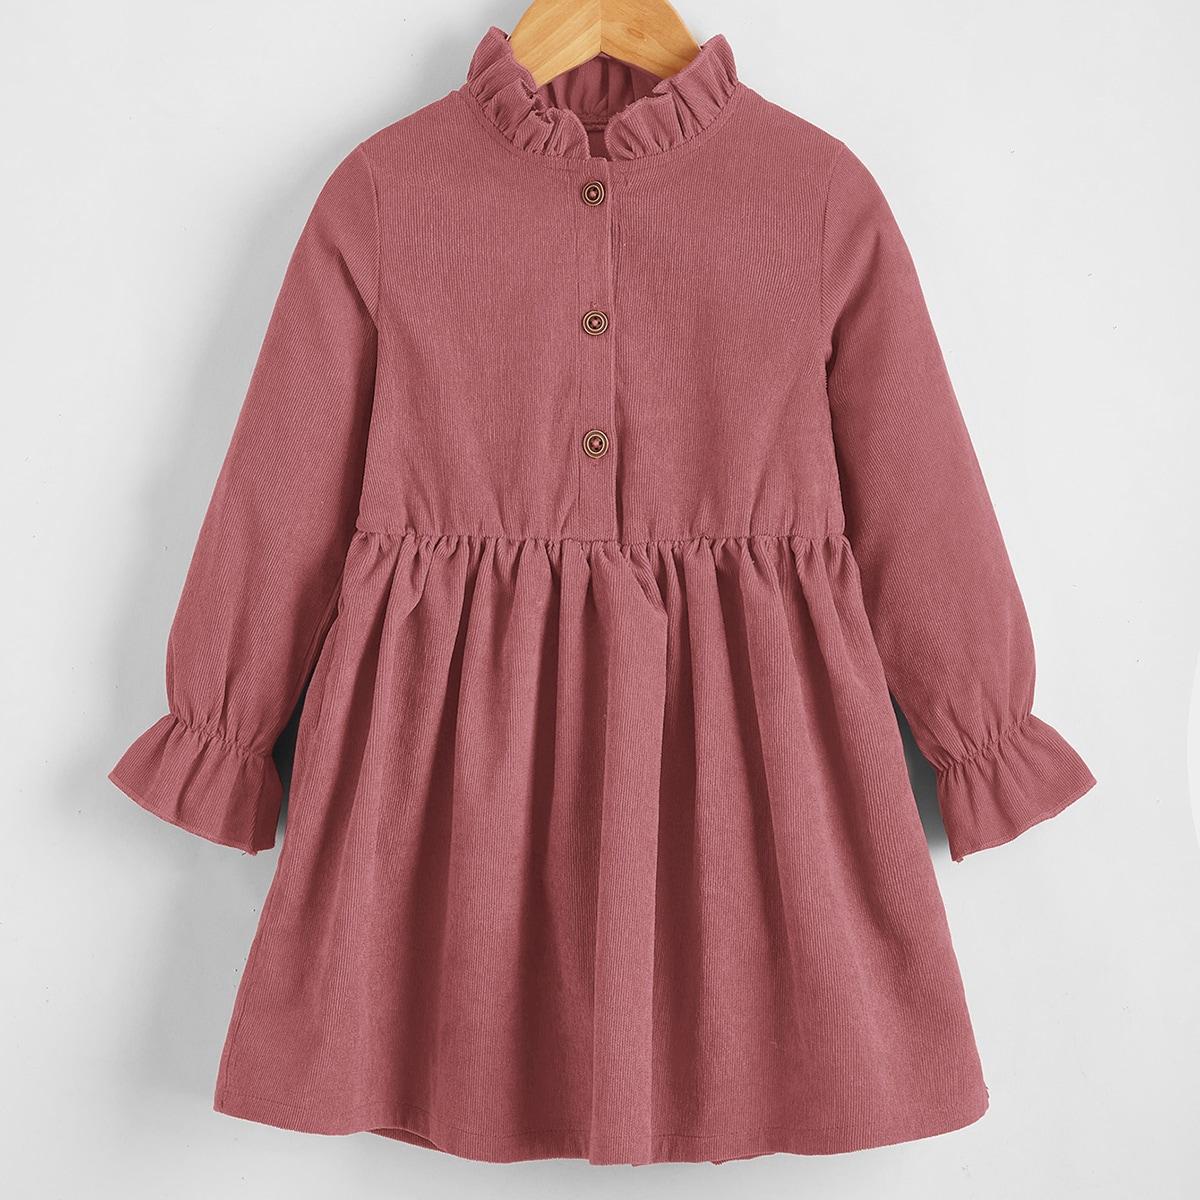 Toddler Girls Ruffle Neck Half Button Corduroy Dress